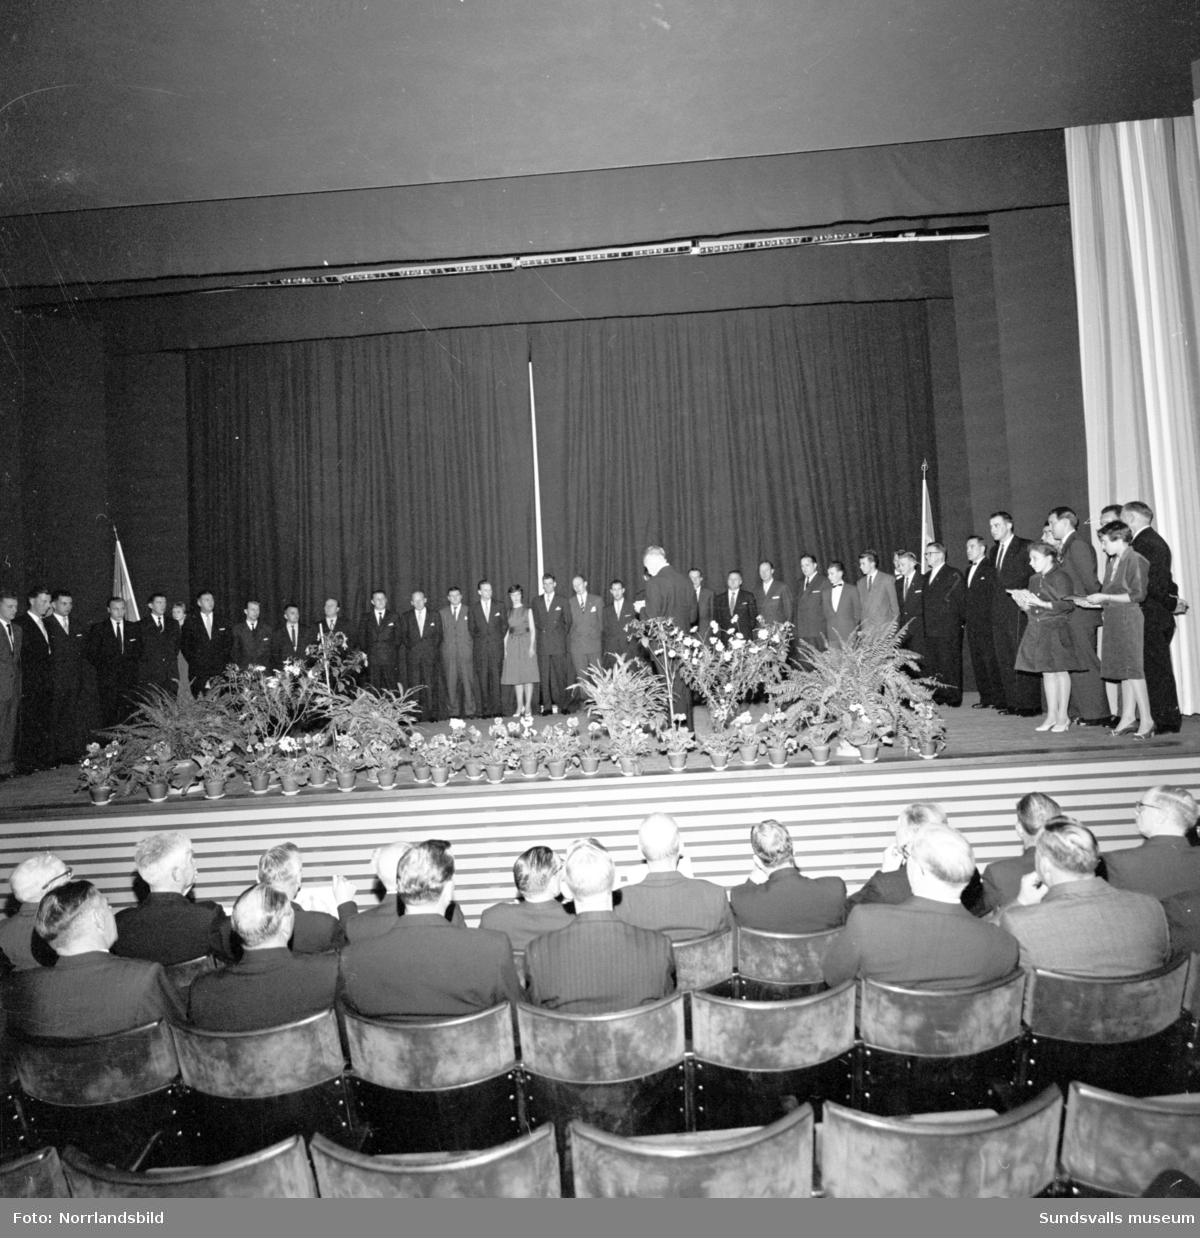 Idrottsklubben Heffners IF firar 60-årsjubileum i Skönsbergs Folkets hus, 1898-1958.